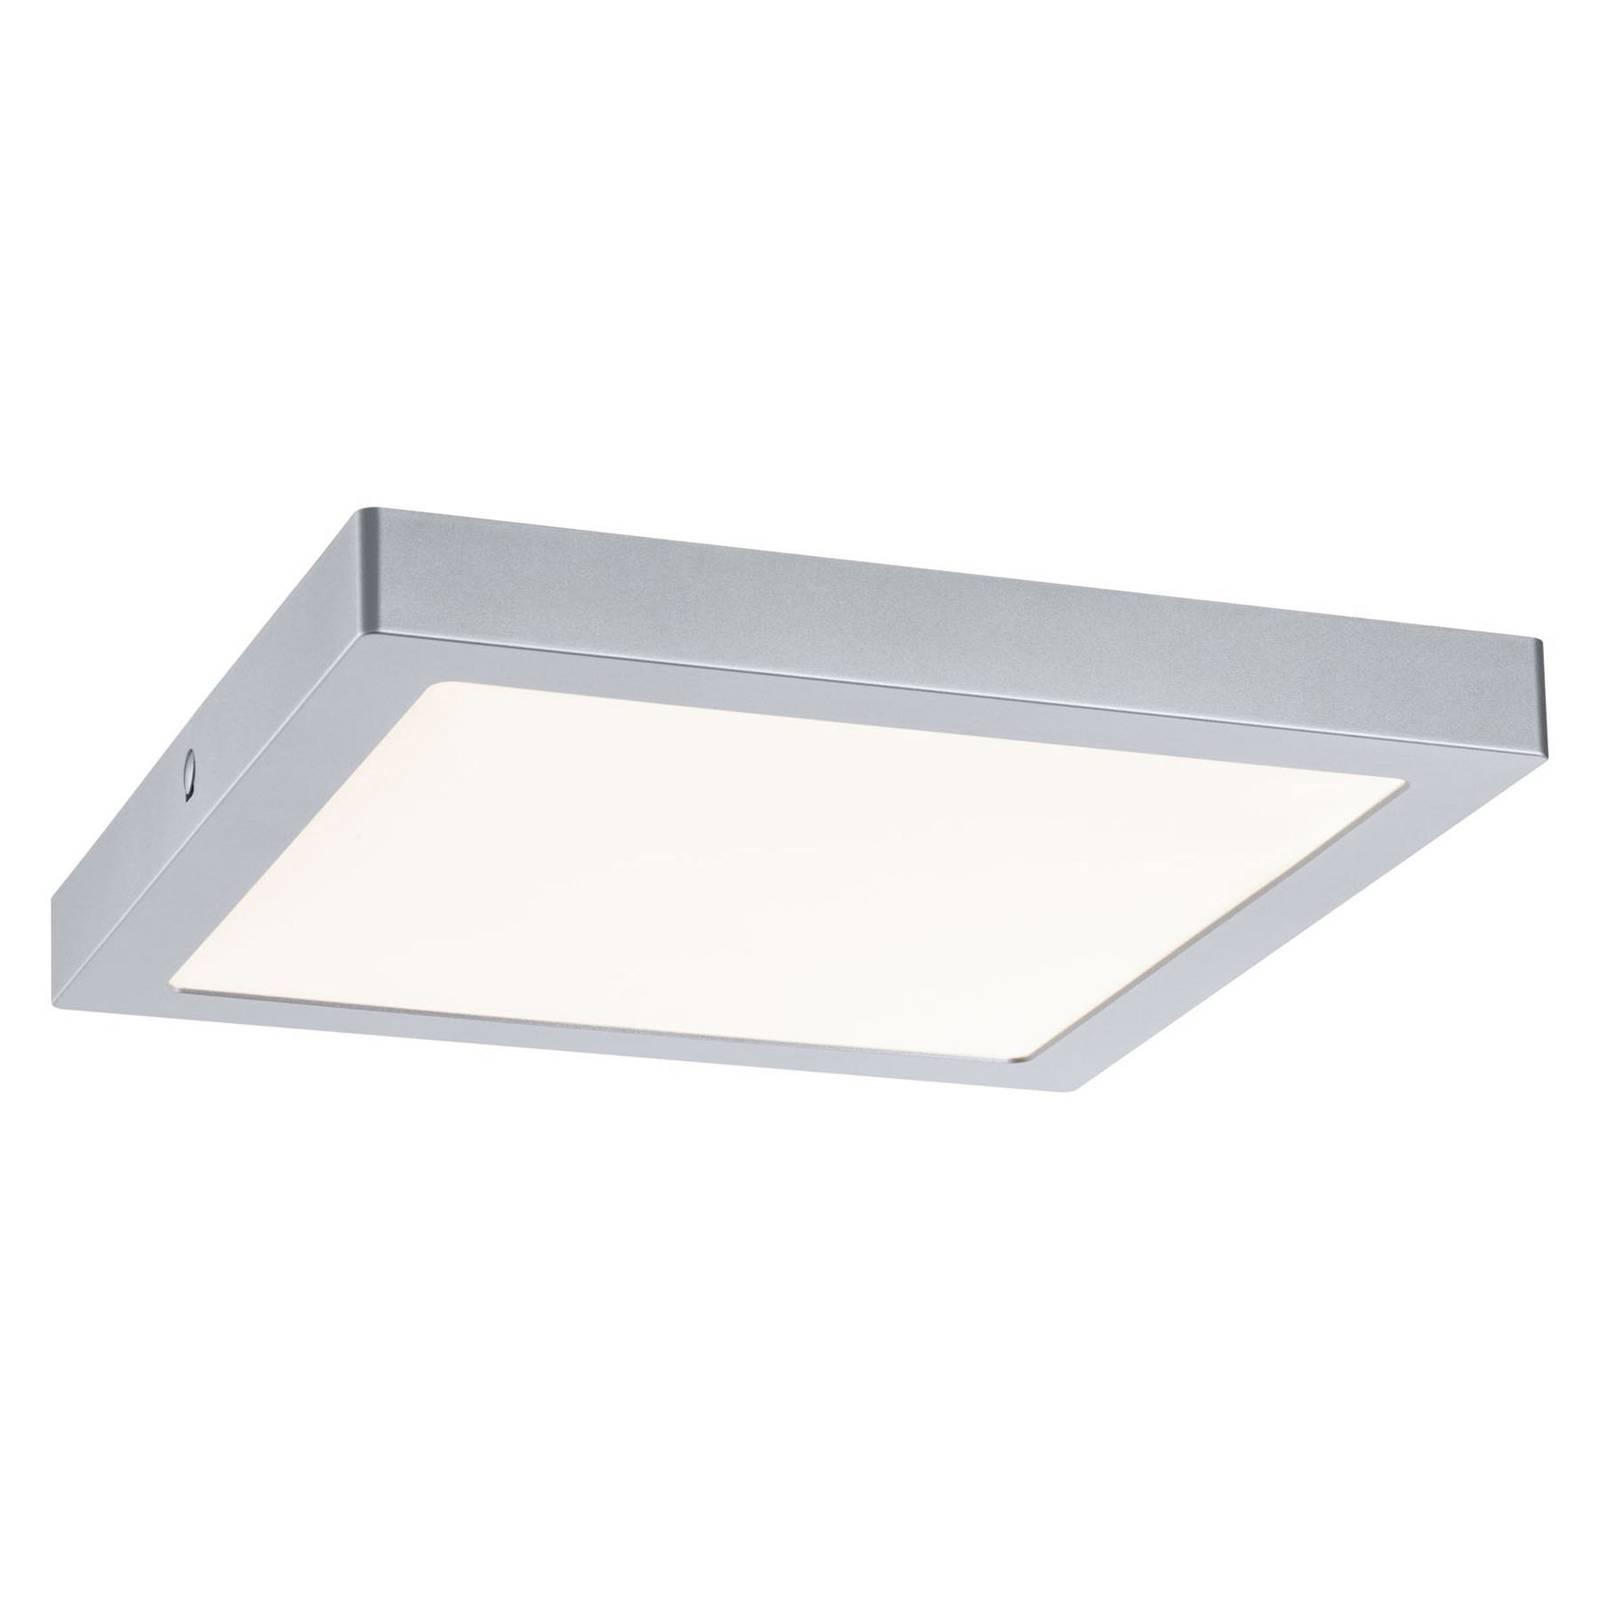 Paulmann Abia LED-Deckenleuchte 30x30 cm chrom